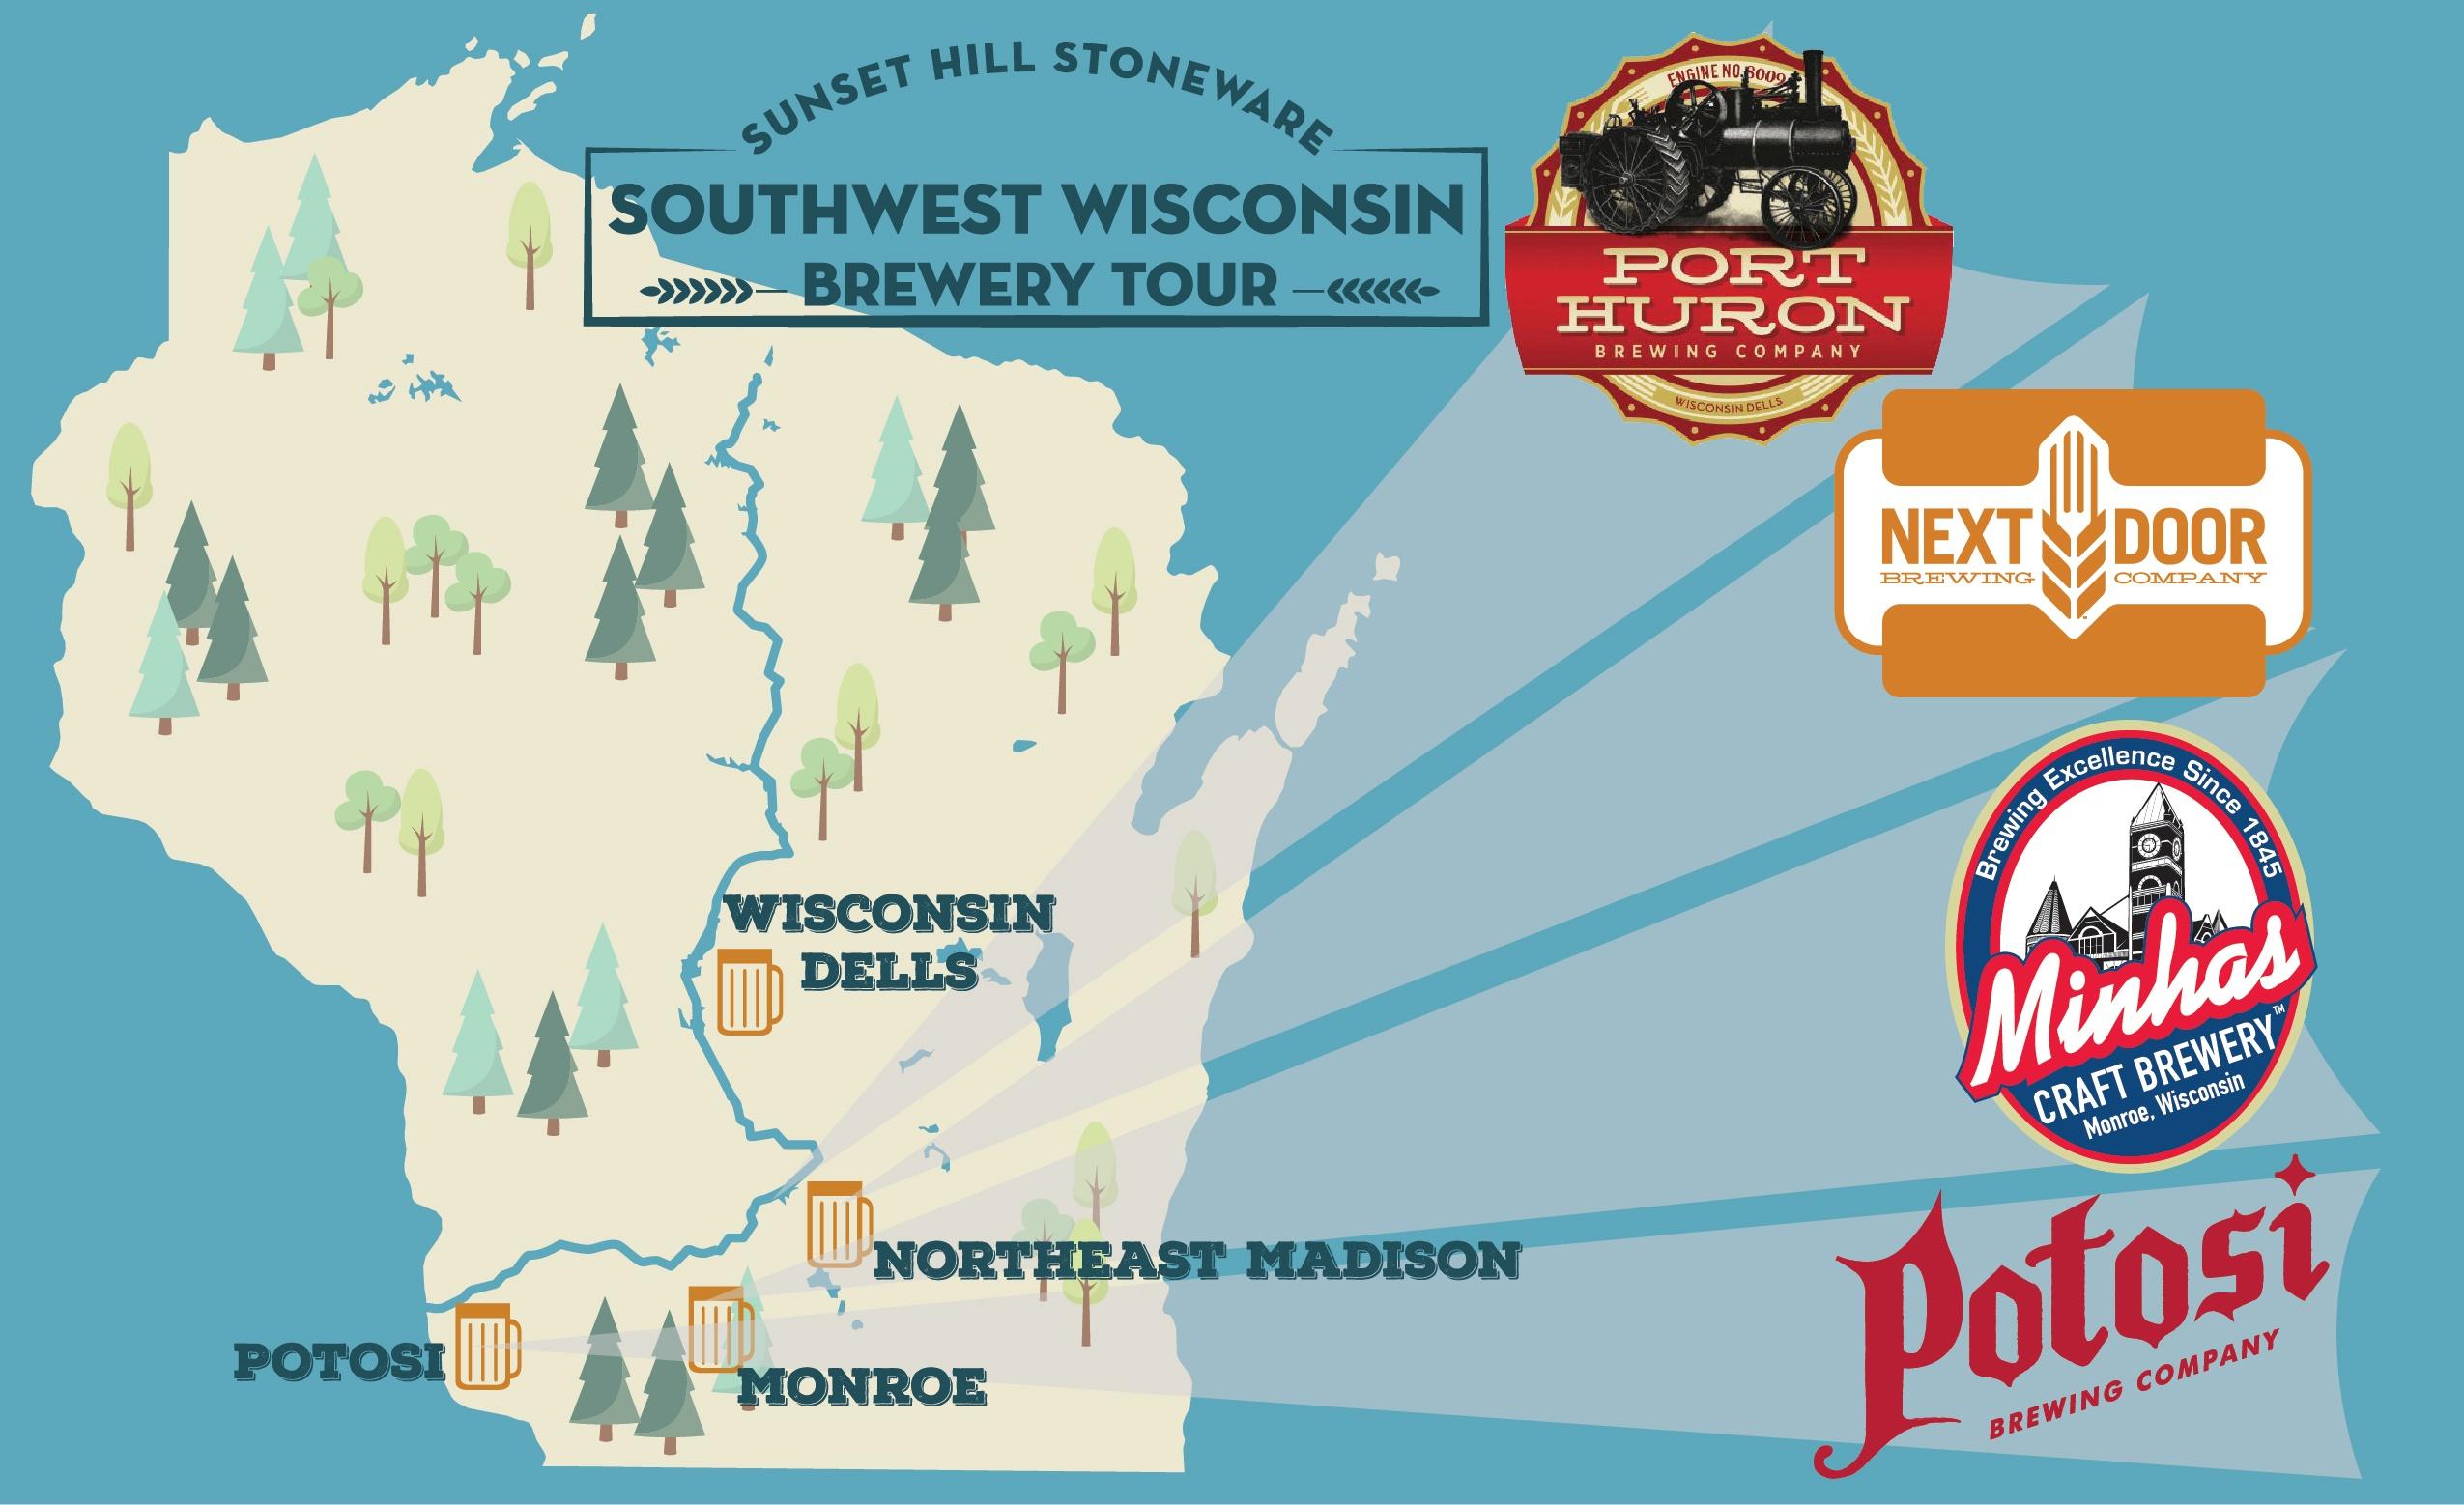 Brew Tour: Find Sunset Hill Stoneware in Southwest Wisconsin